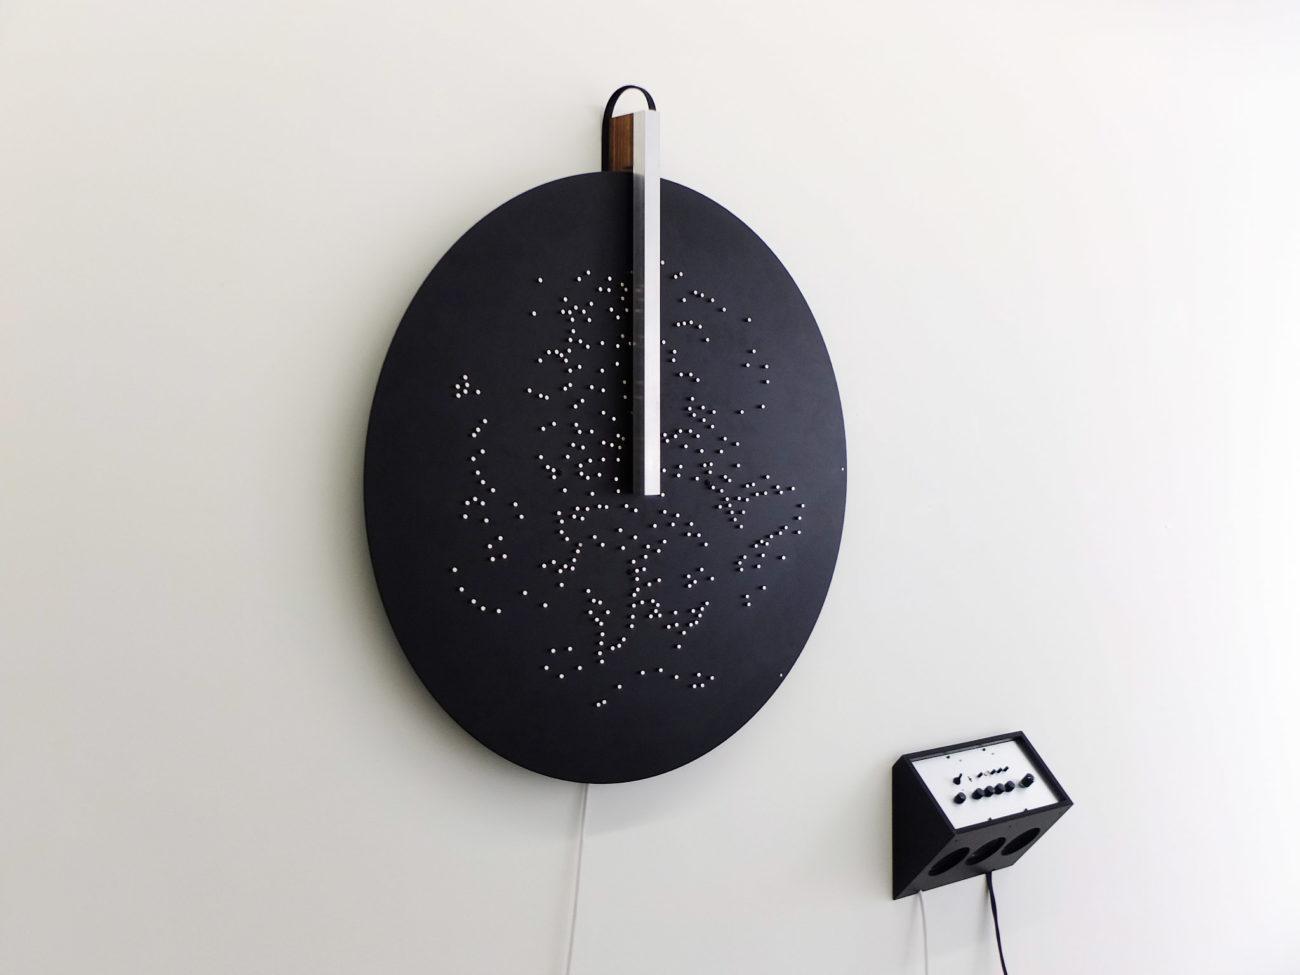 Messenger - Flavien Théry - Installation - Mirage Festival